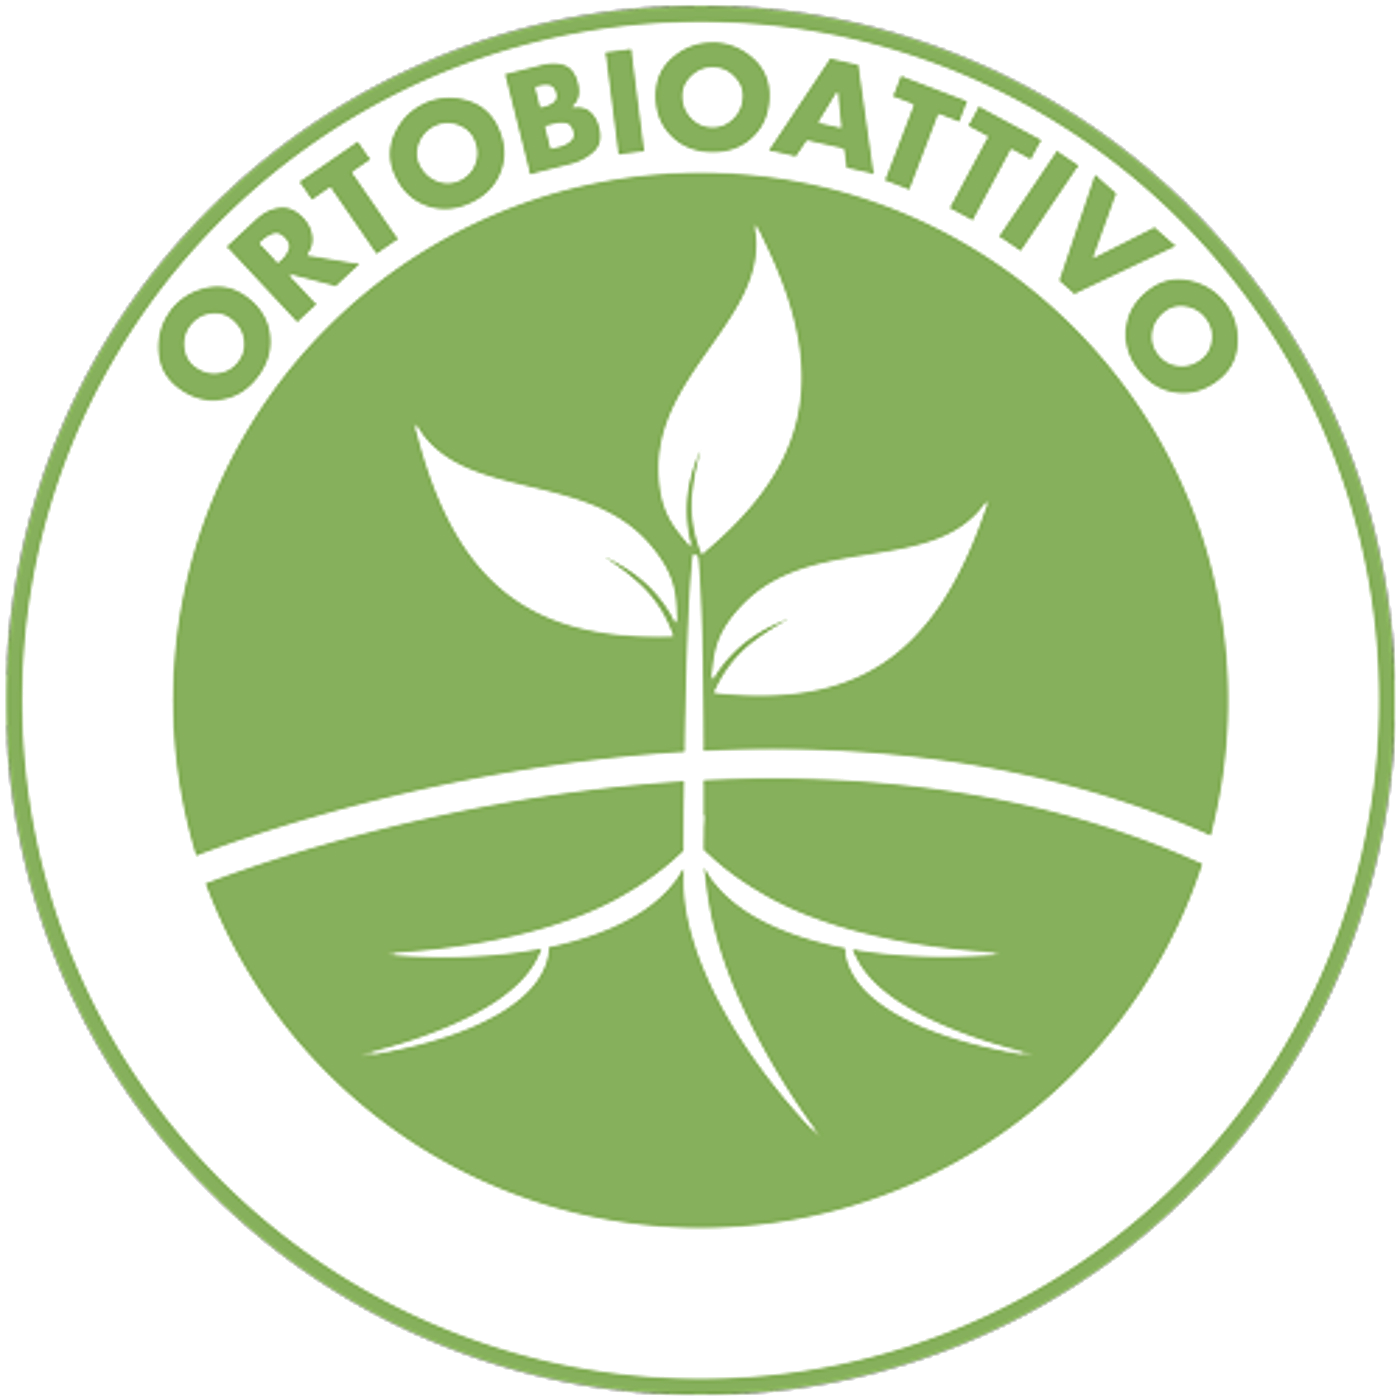 Ortobioattivo